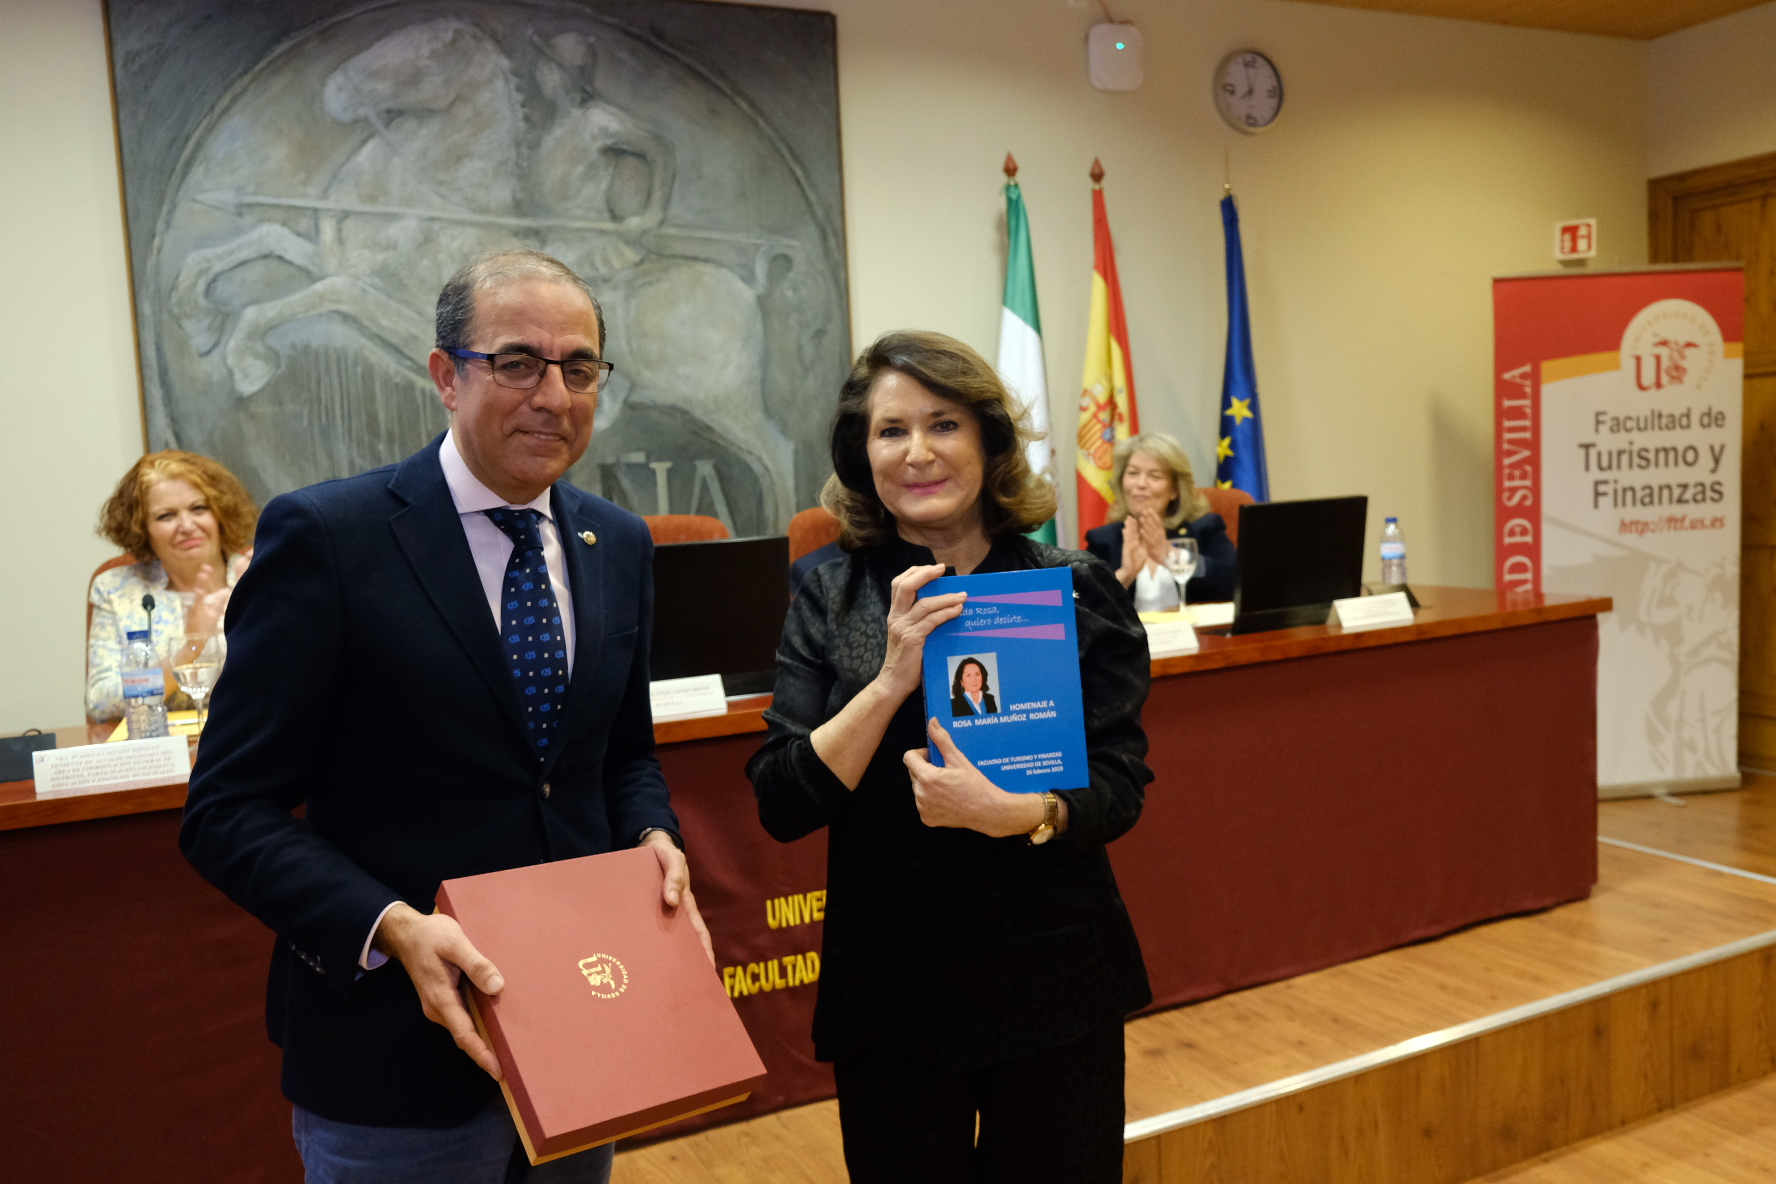 Entrañable homenaje a Rosa Muñoz Román, profesora de la Universidad de Sevilla